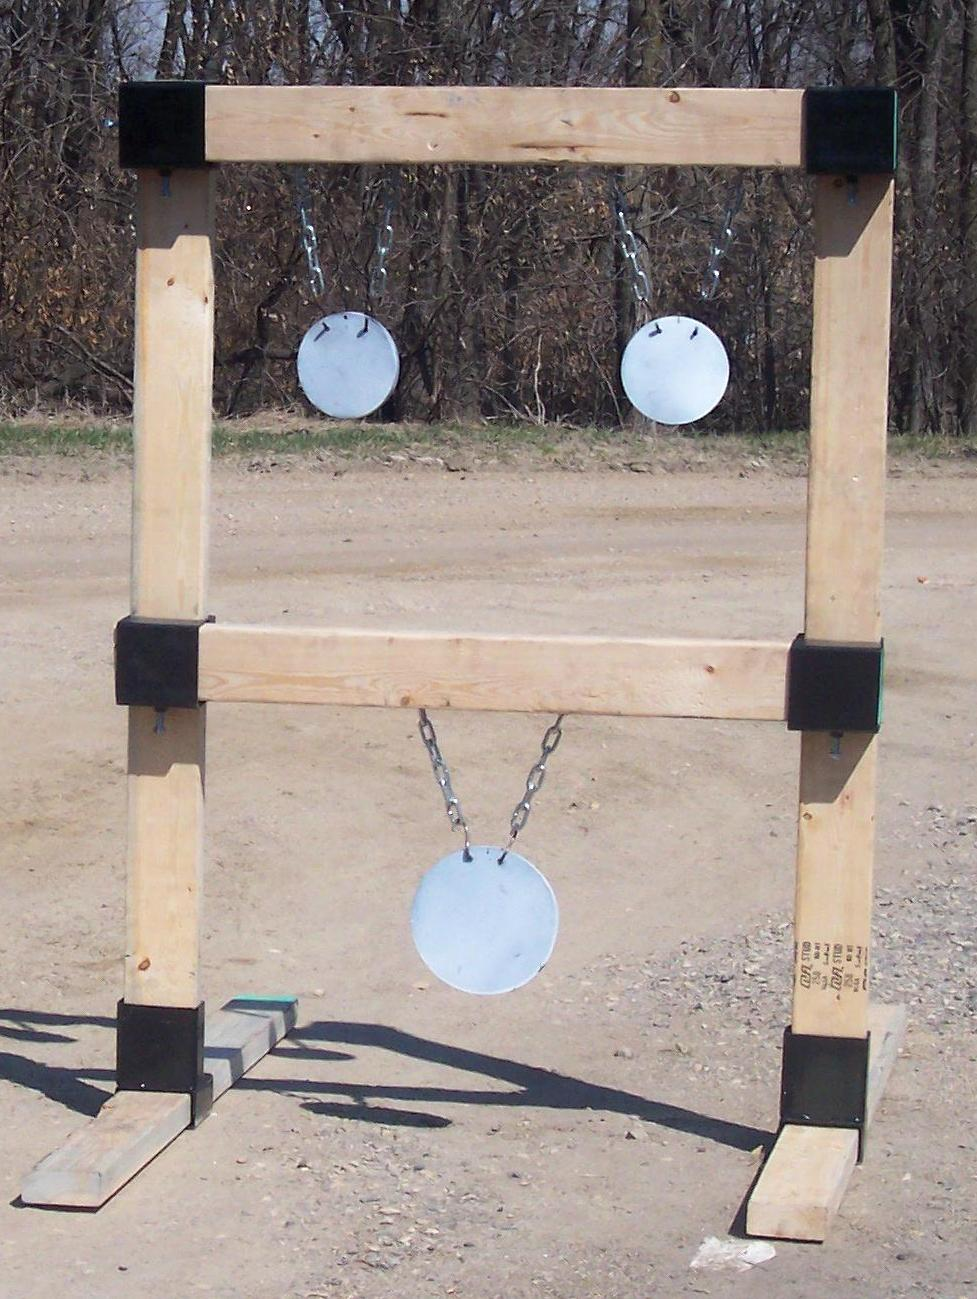 2x4 Hanging Target Stand Custom Steel Targets